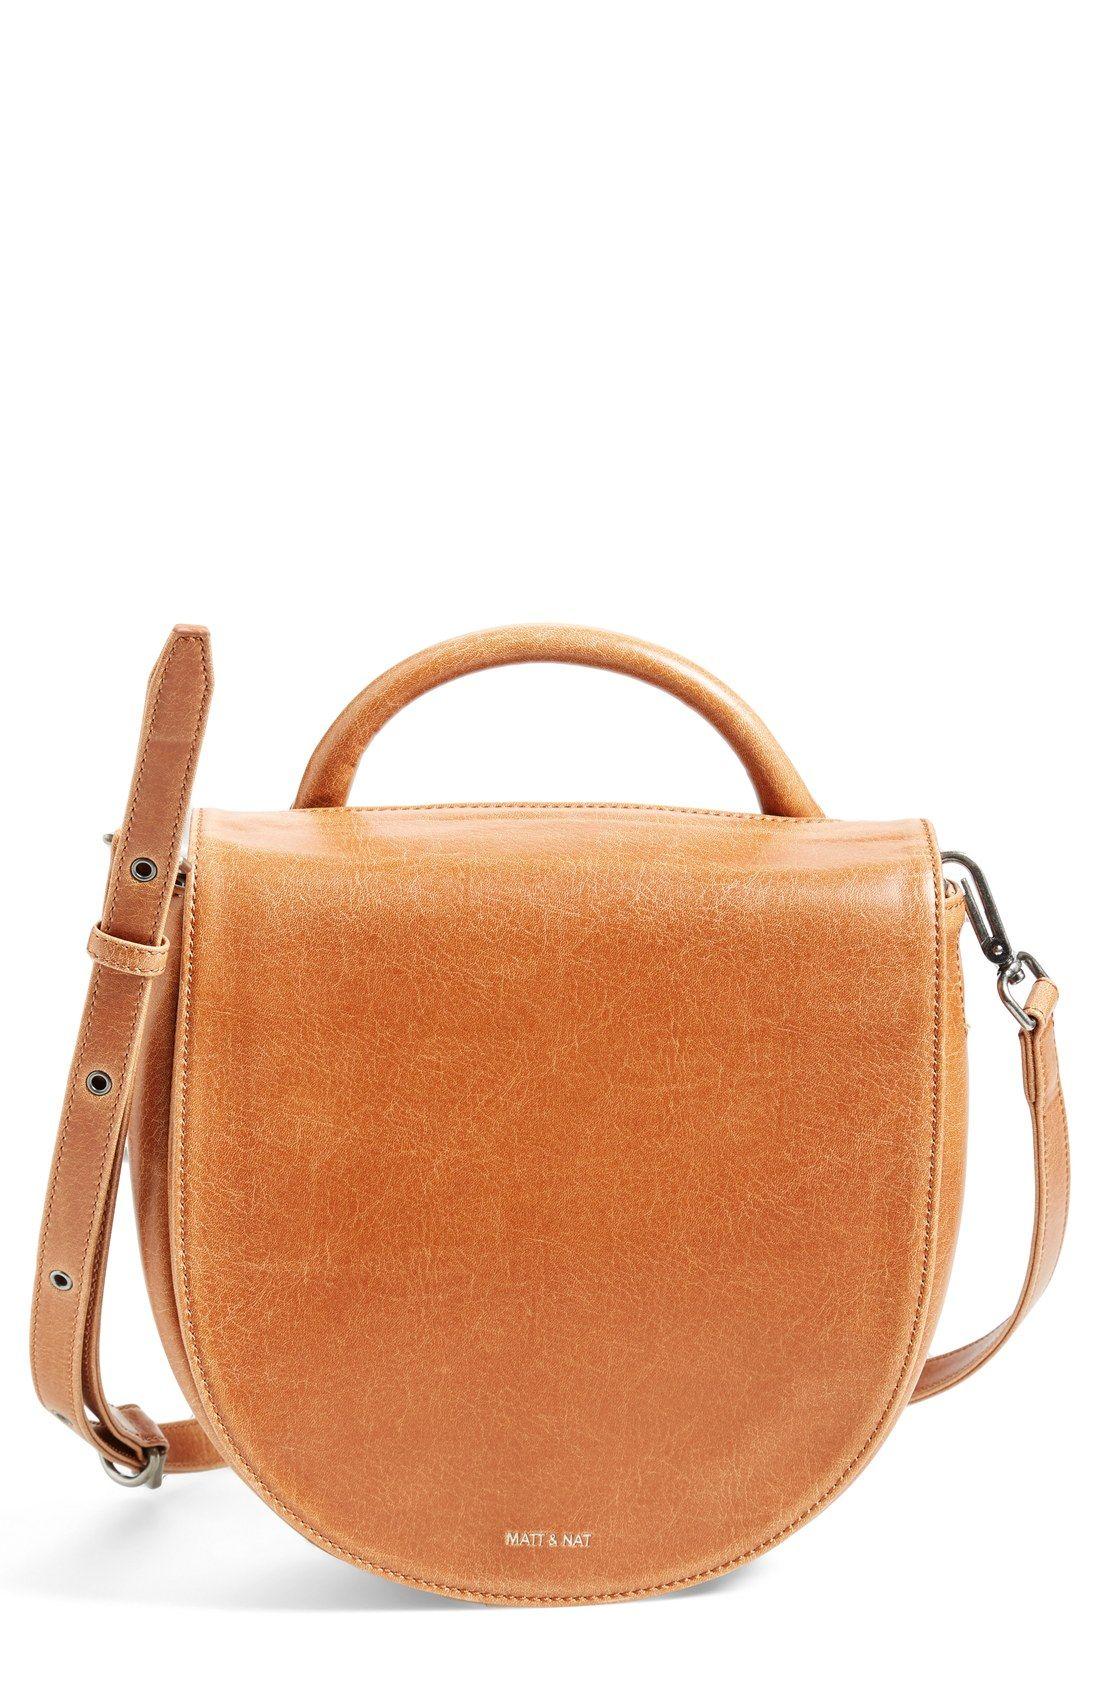 Matt Nat Parabole Vegan Leather Crossbody Bag Curly 130